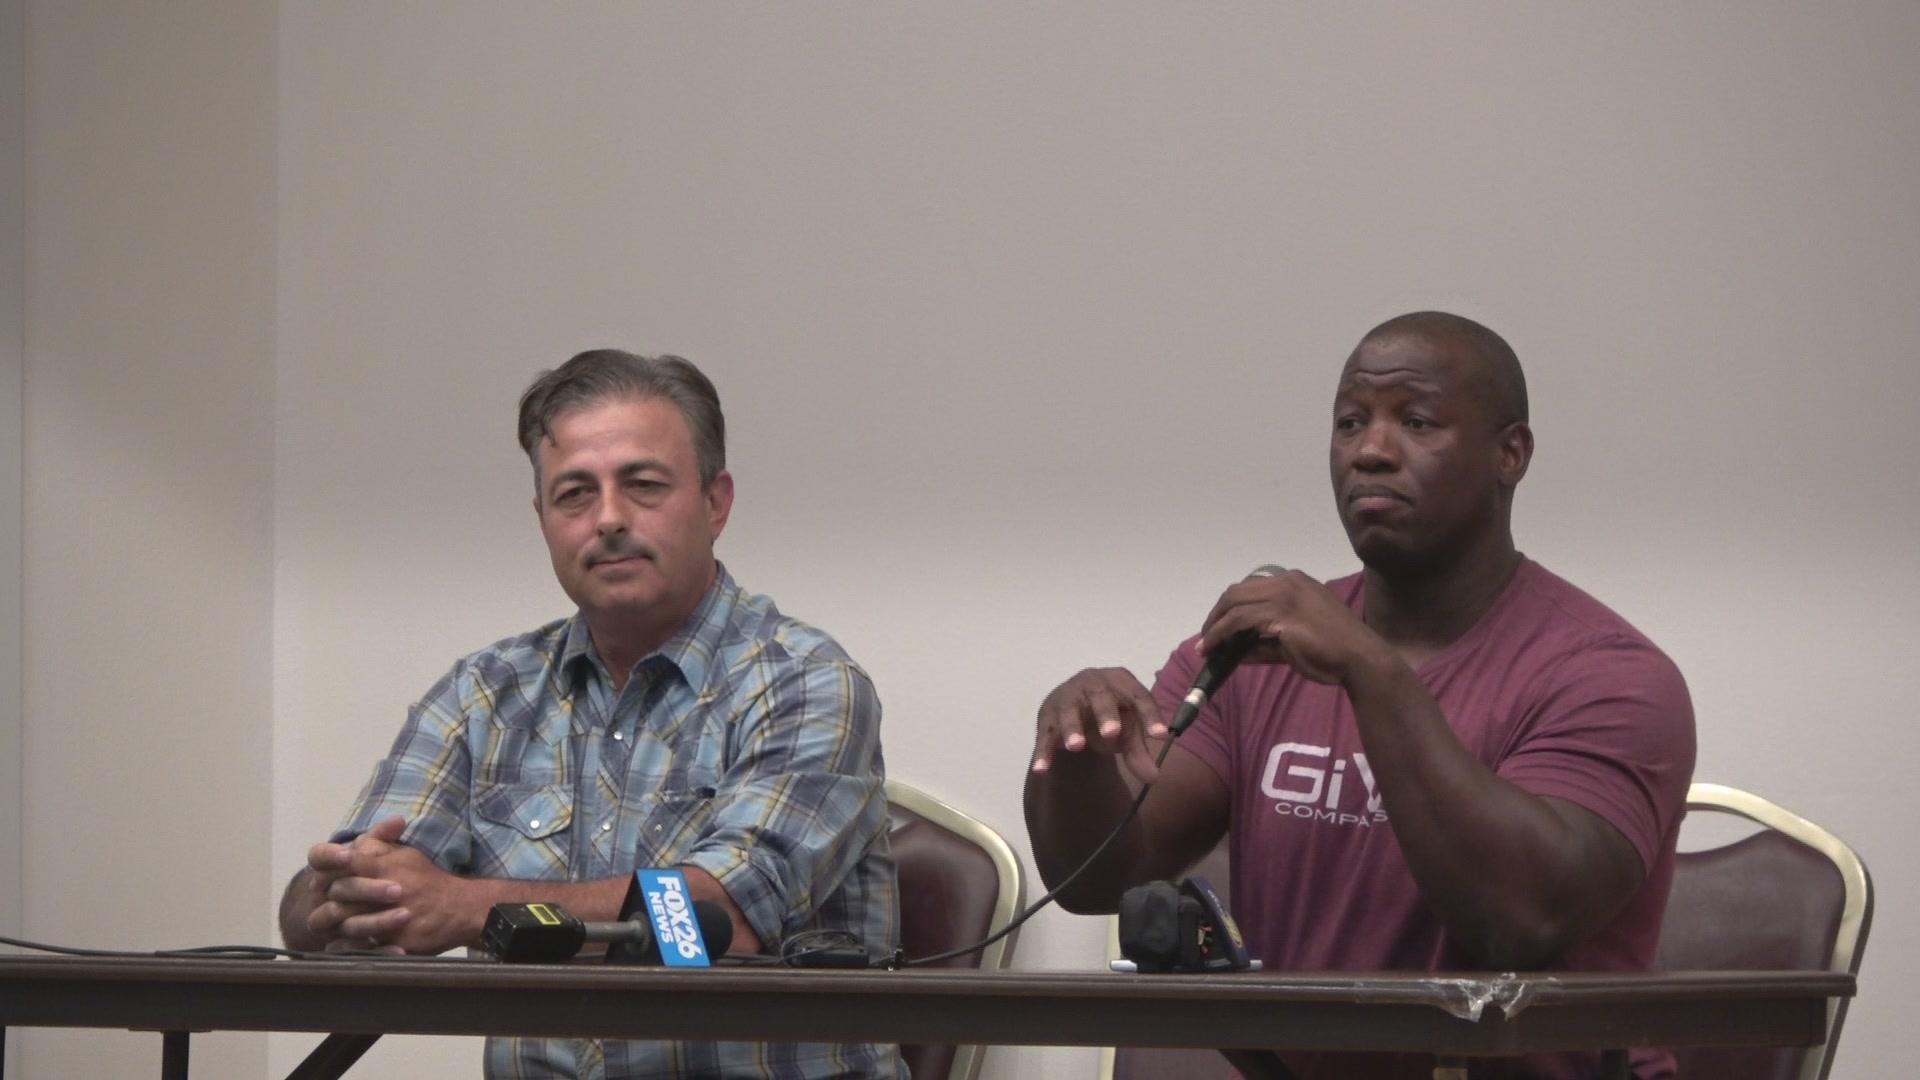 Xavier Avila And Carlton Jones Spoke At Jones Townhall Forum On Thursday Night Tony Maldonado Valley Voice